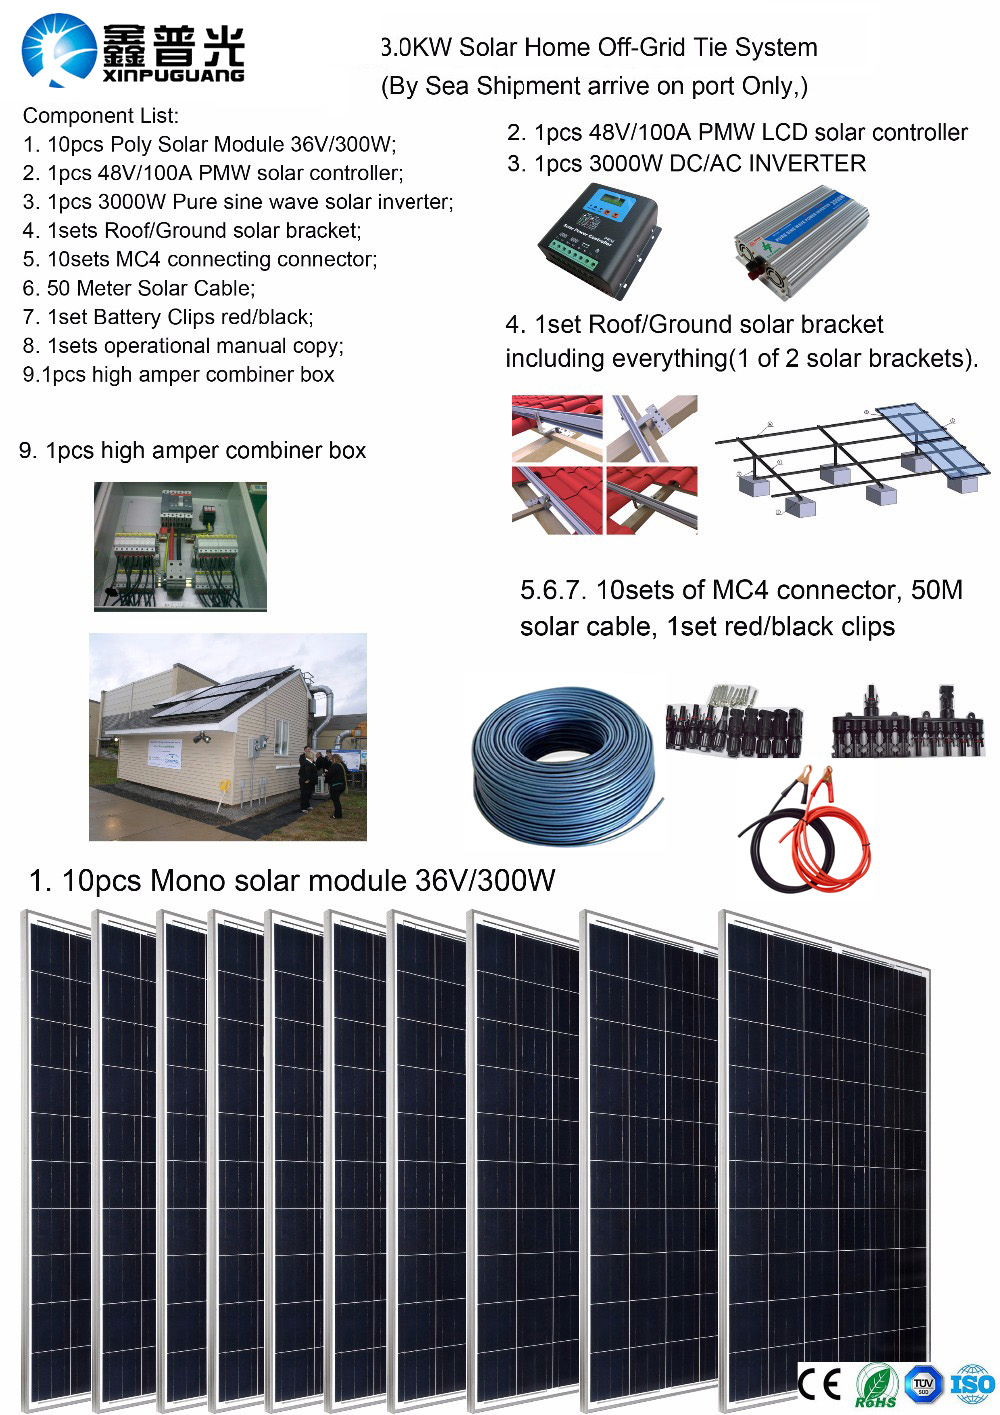 Solar panel 48v 110V 220V 3000W Solar Home off-grid tie systems solar kit by sea 300W Poly solar modules bracket controller DIY